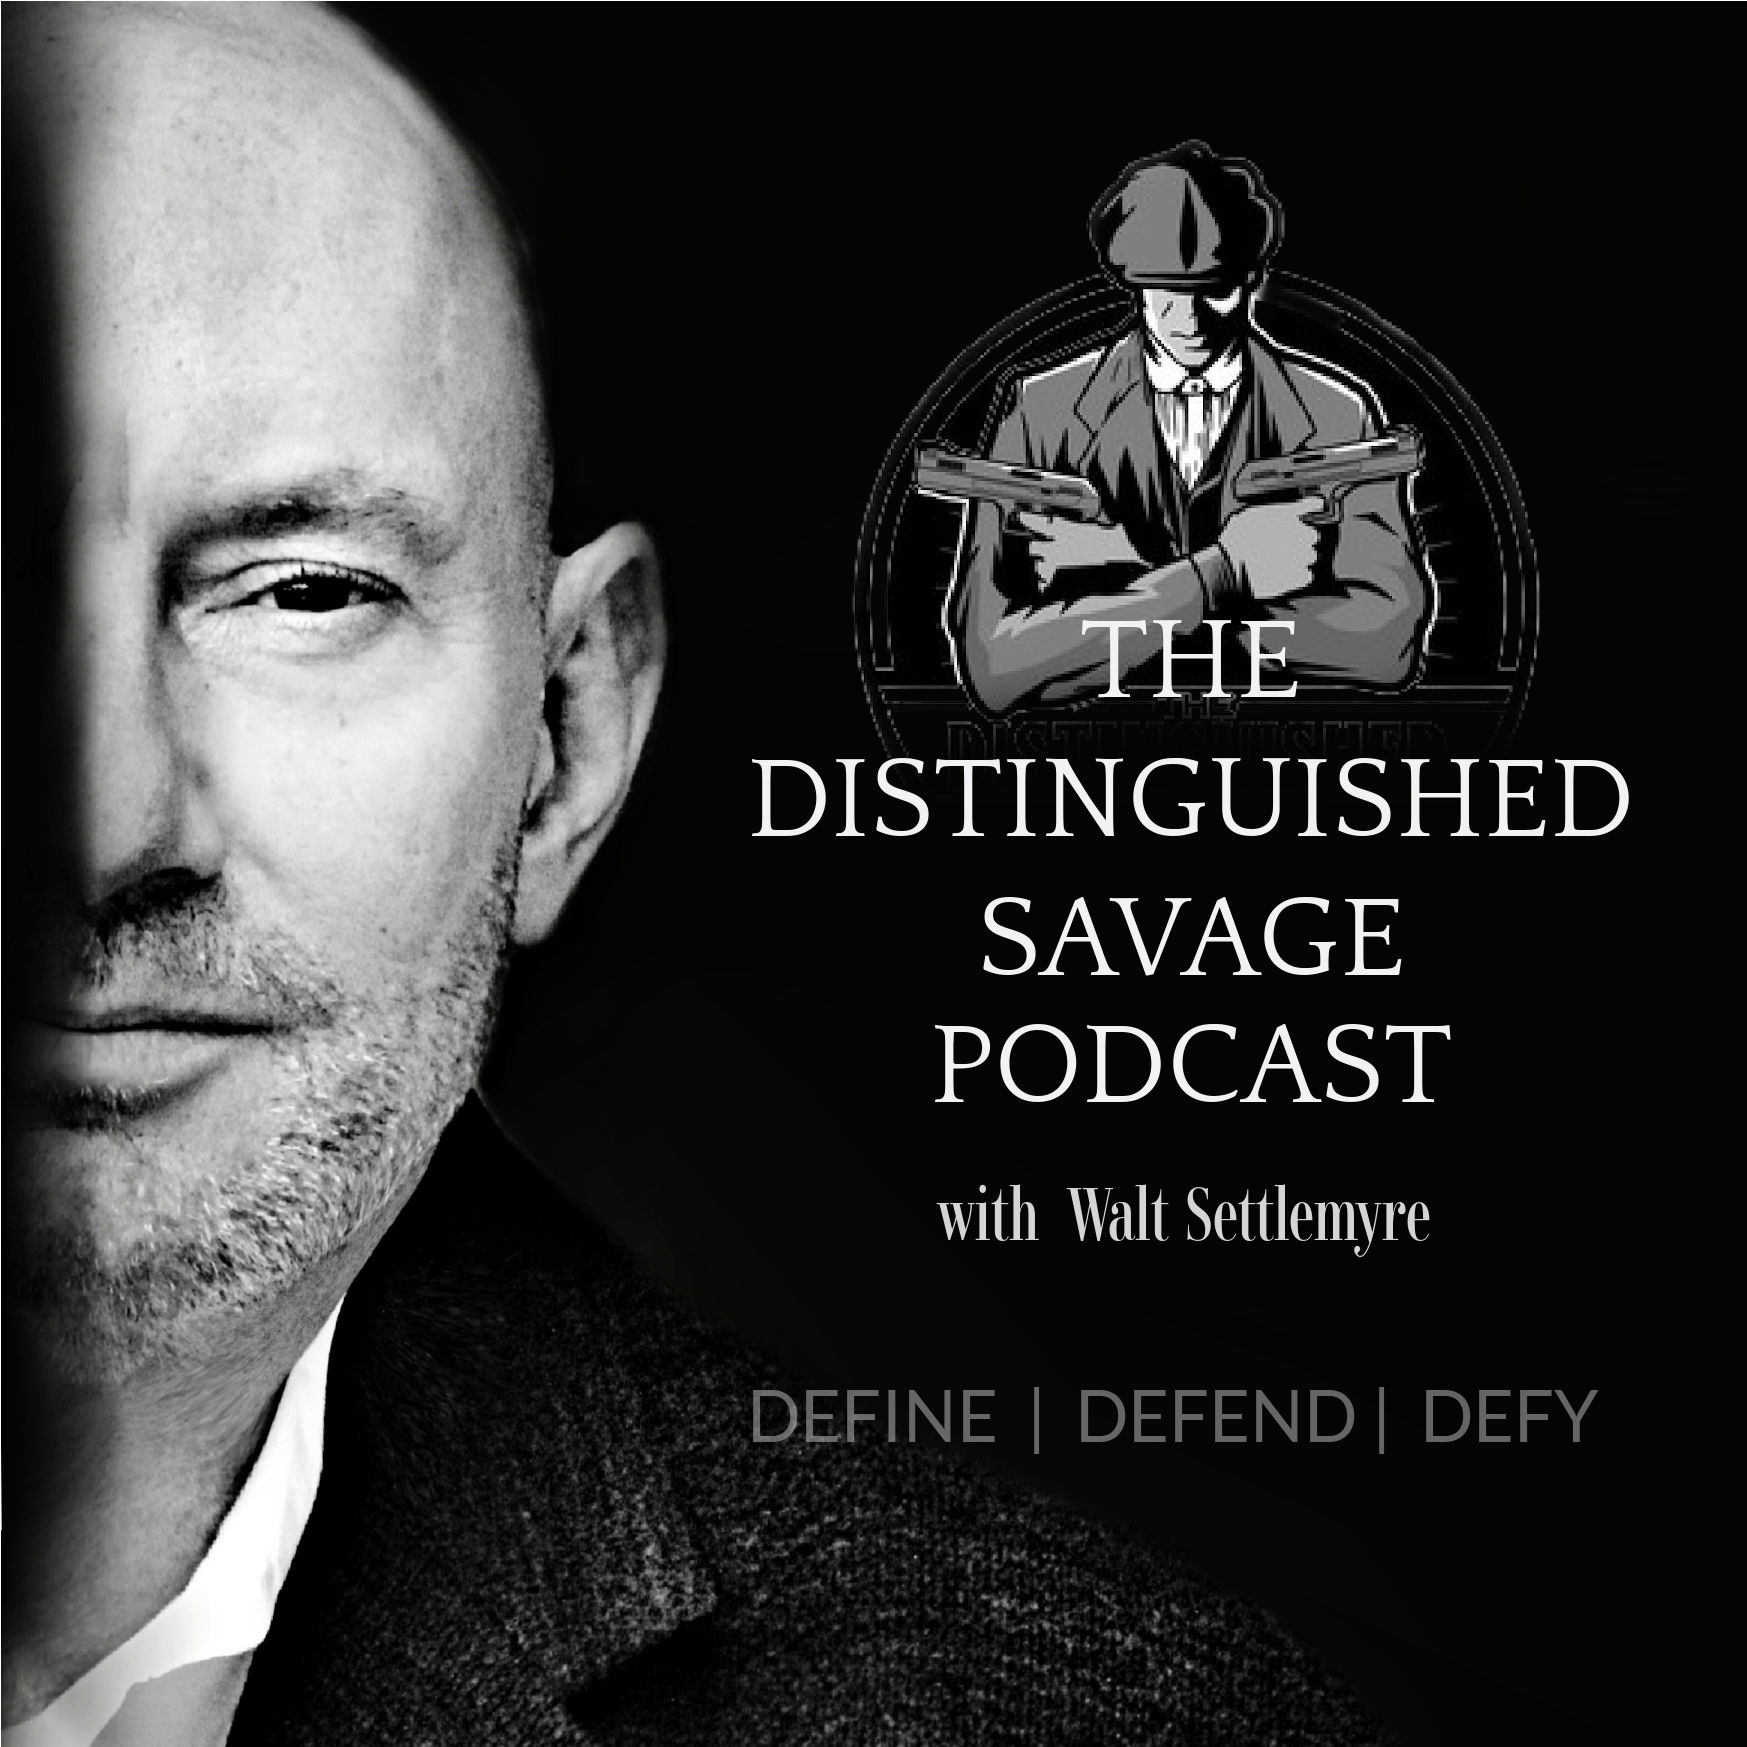 The Distinguished Savage Podcast show art